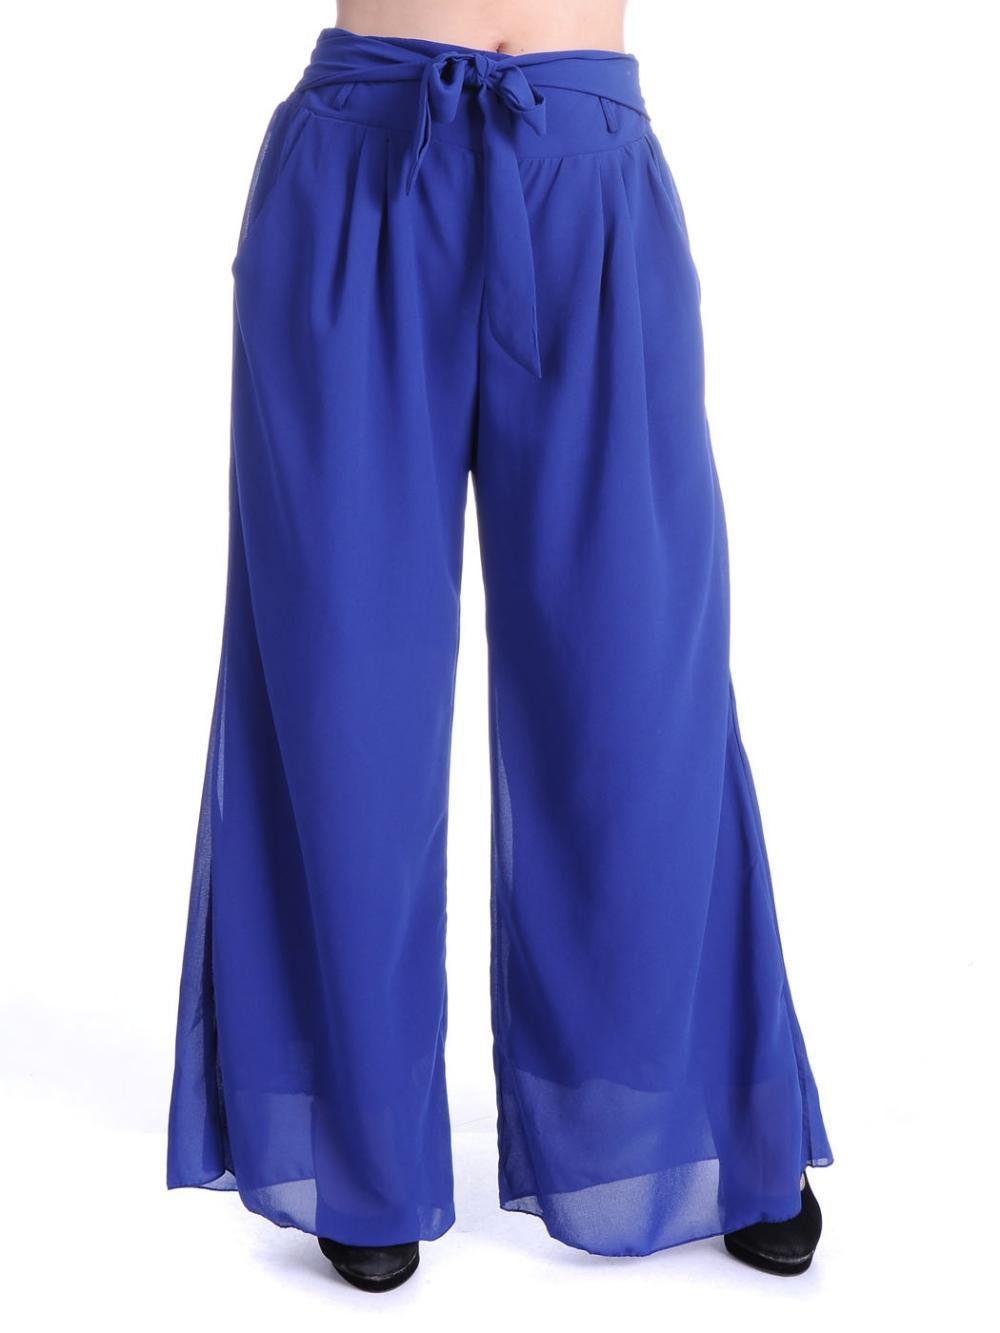 Womens Blue Wide Leg Style Tie Waist Chiffon Trousers